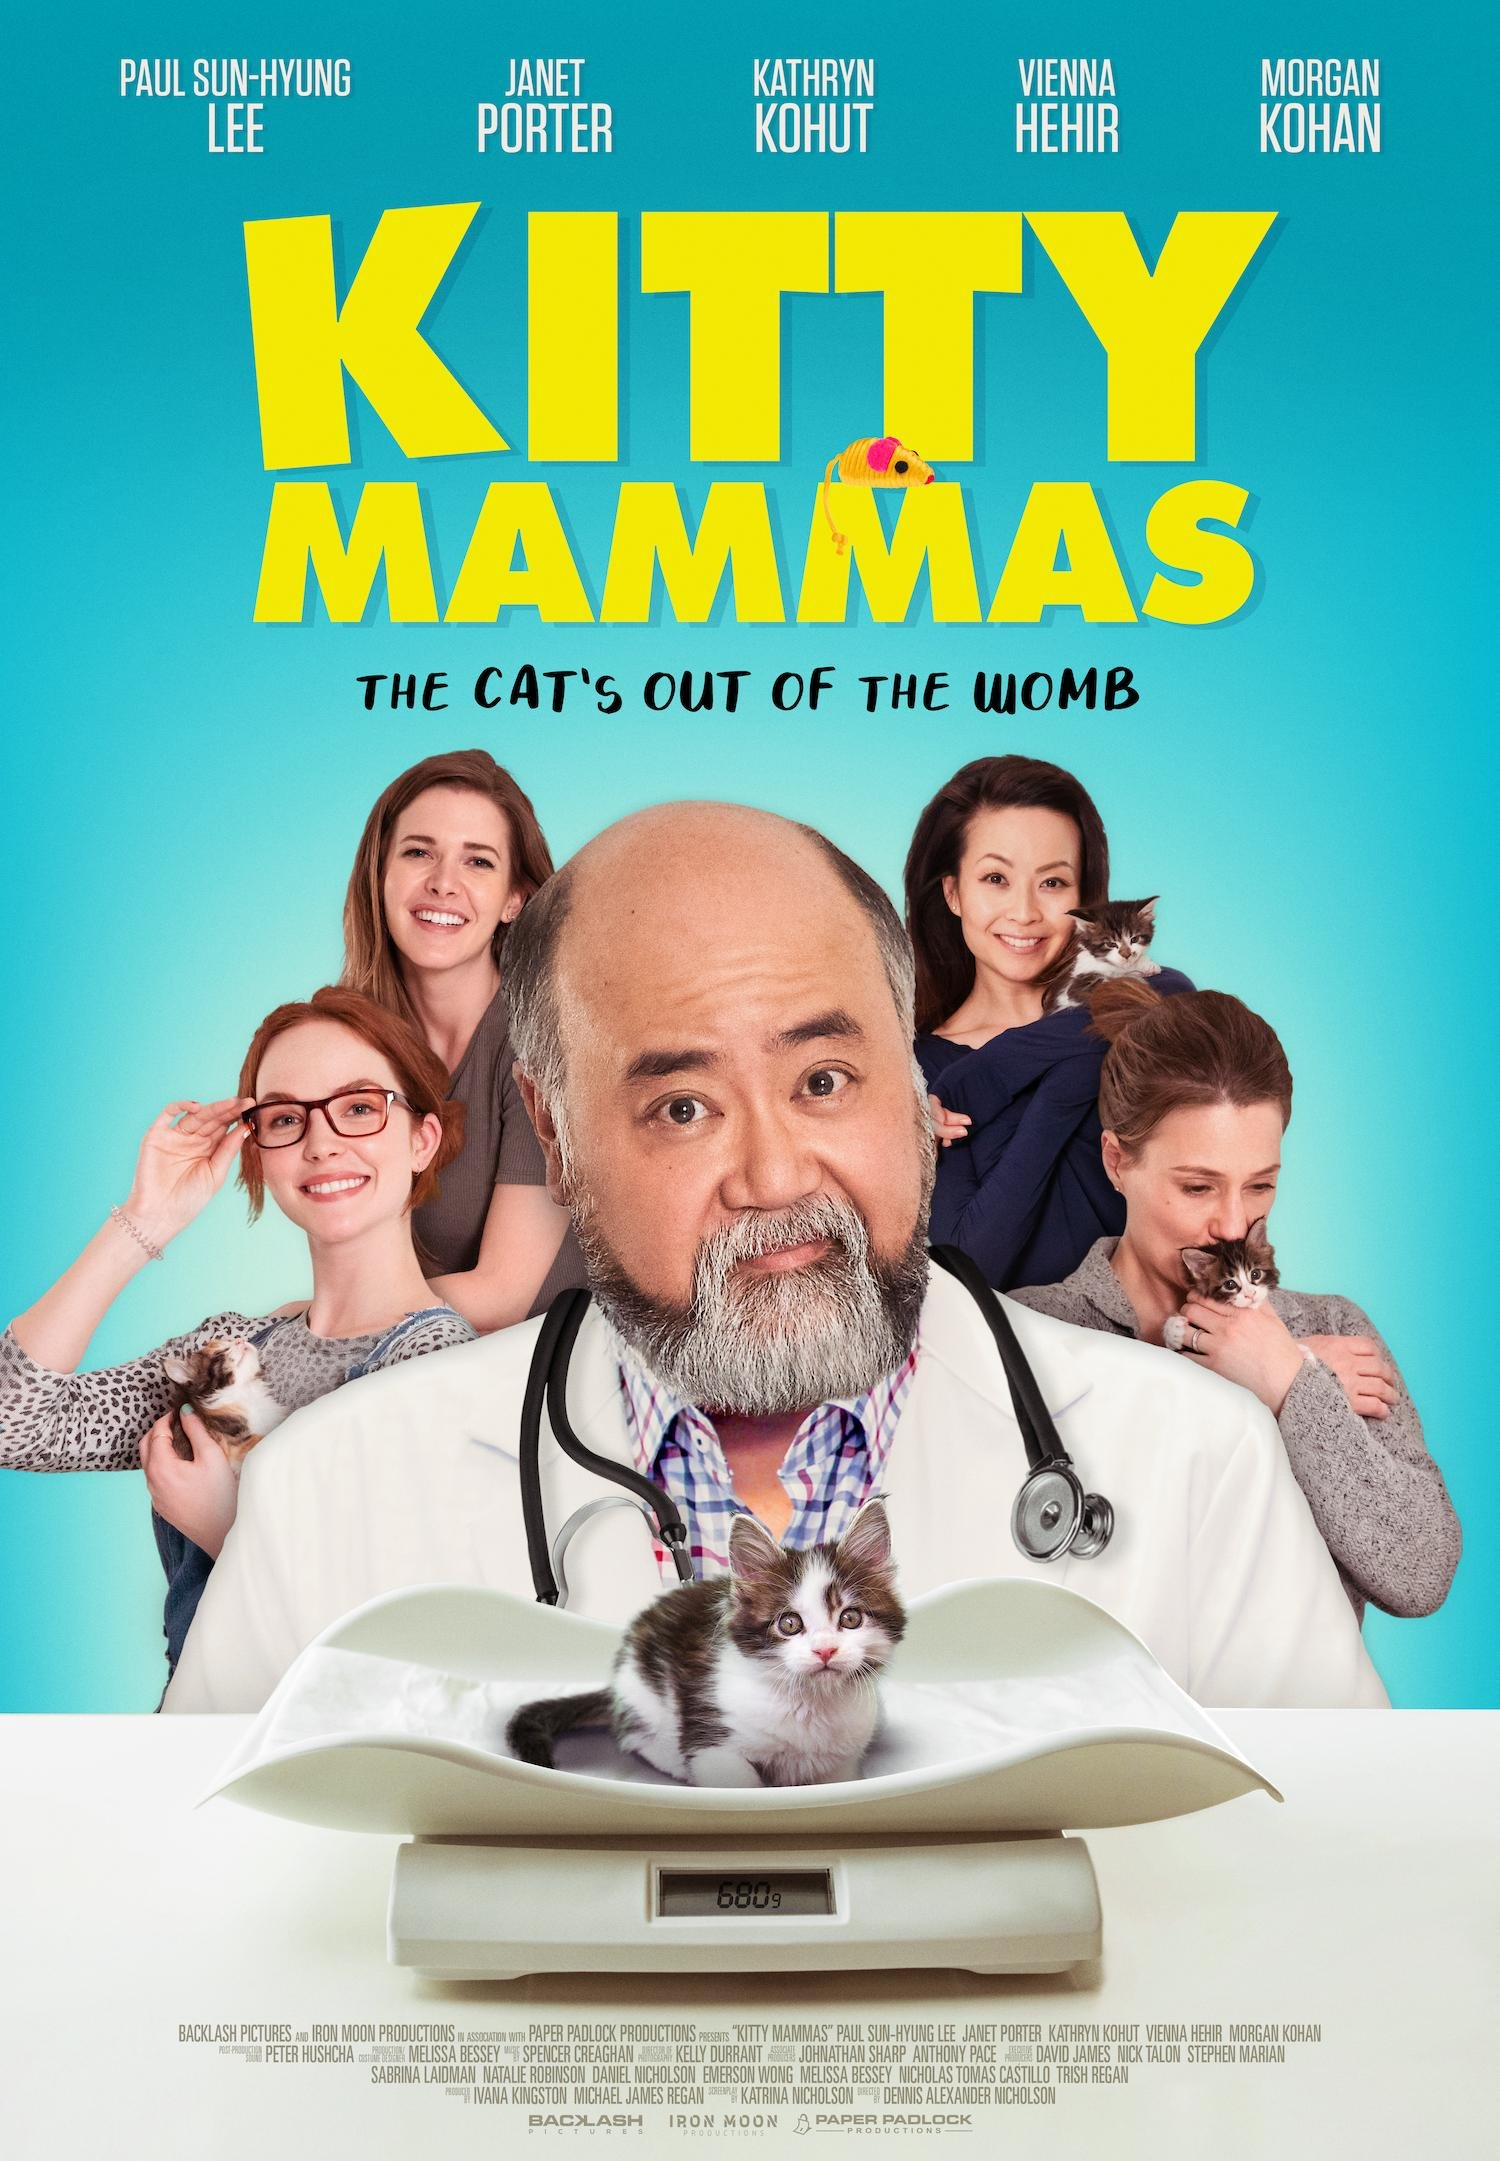 Kitty Mammas poster image